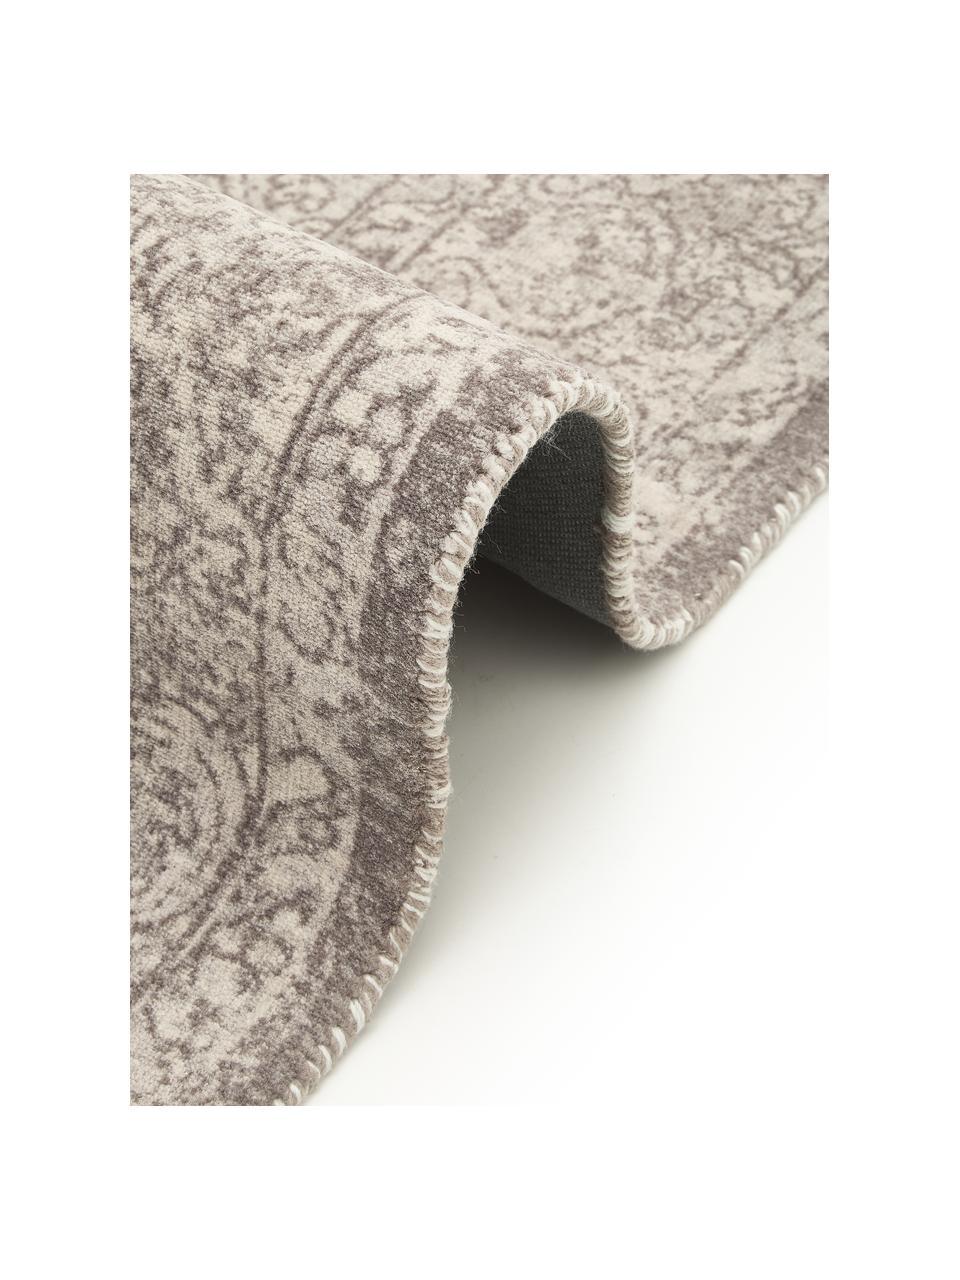 Läufer Elegant im Vintage Style, Flor: 100% Nylon, Grau, 80 x 250 cm